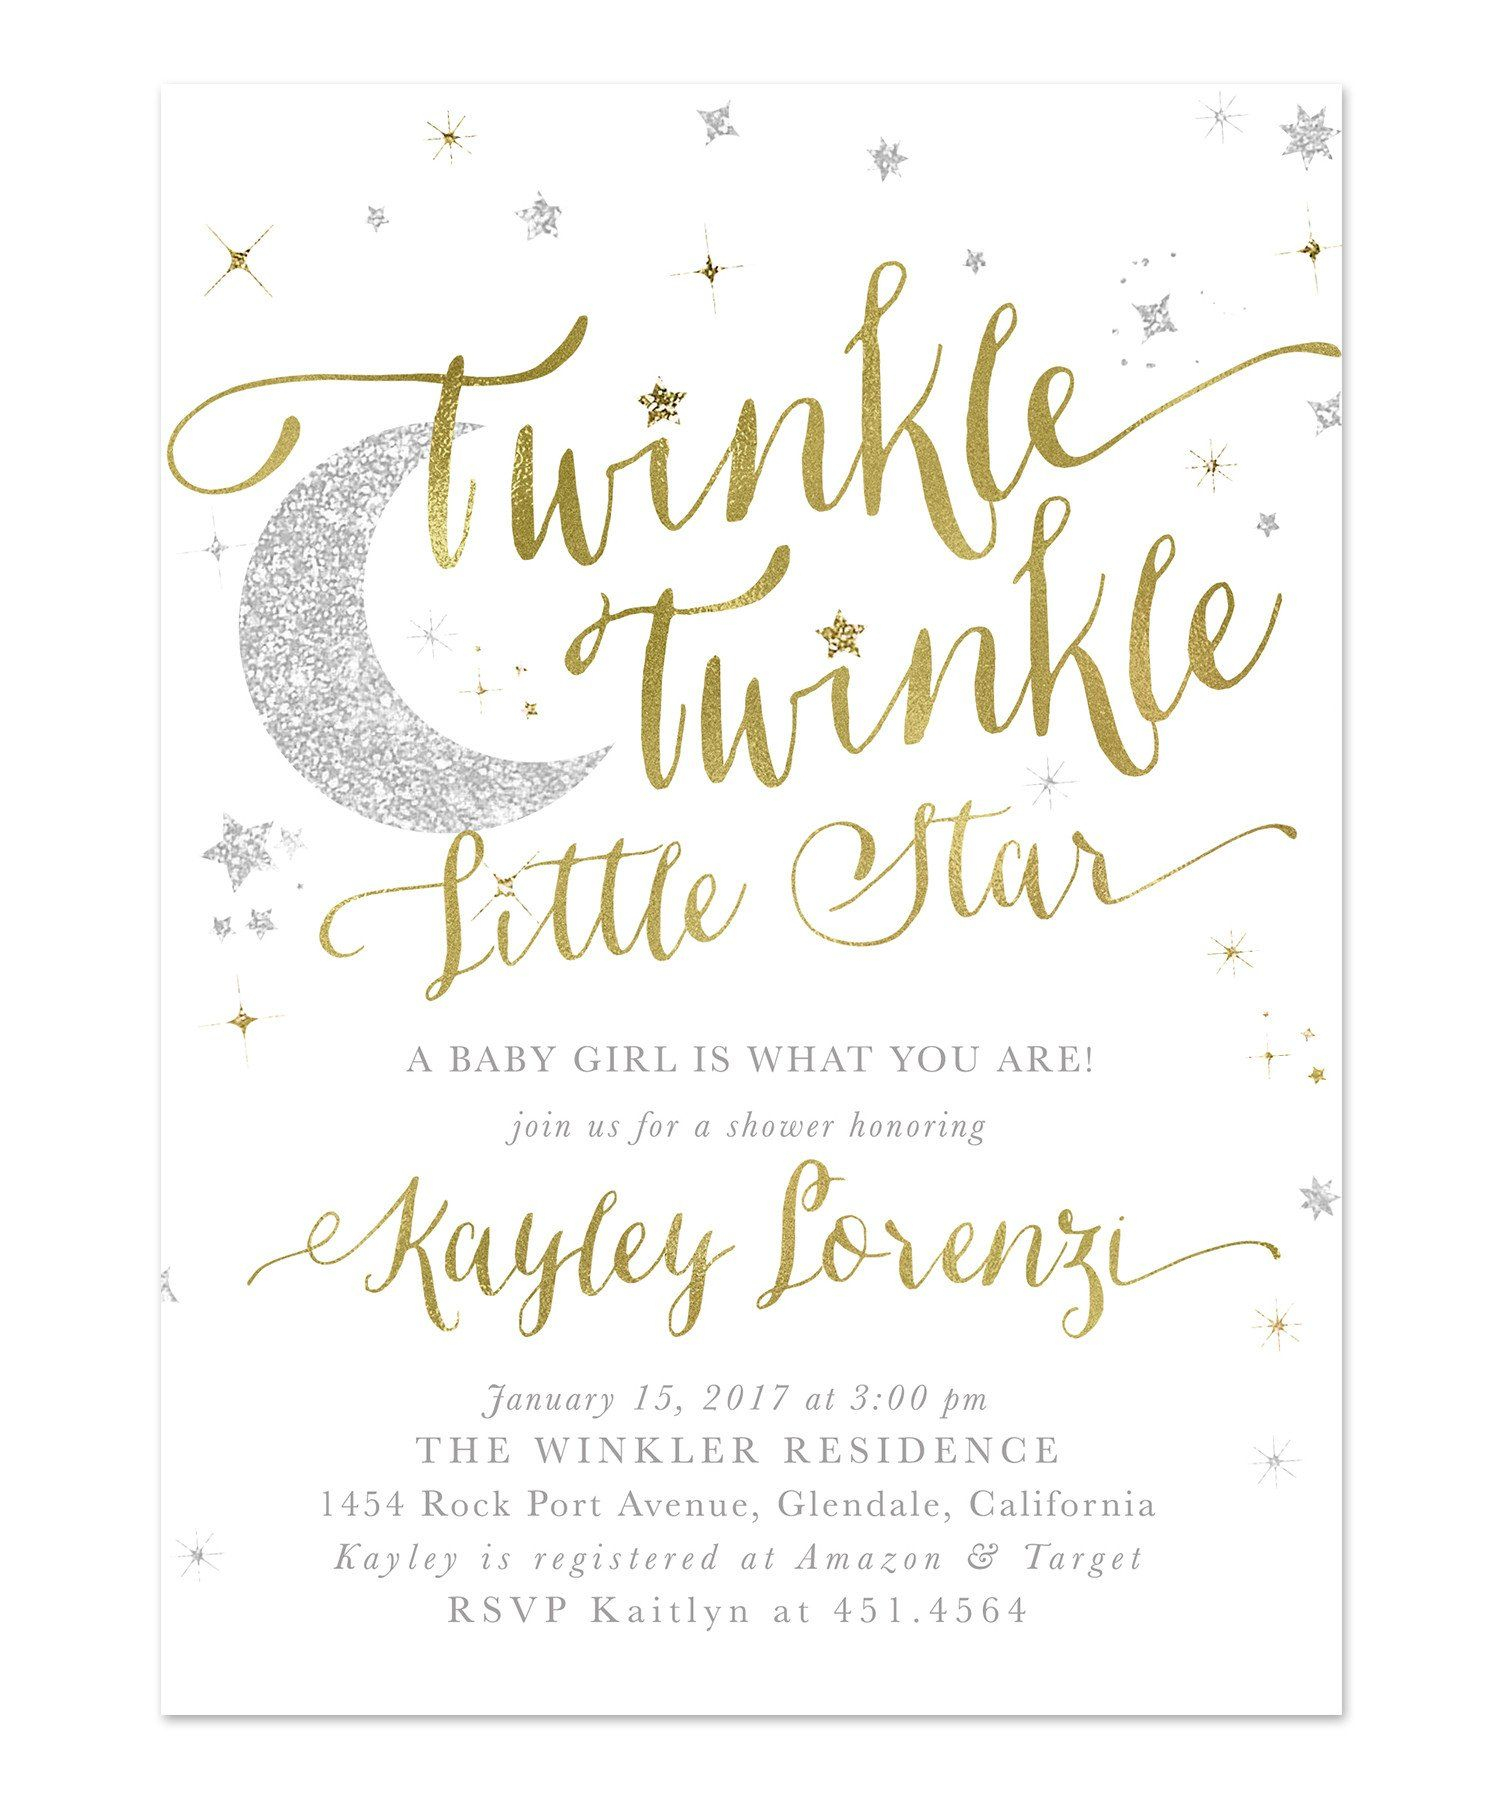 Baby Shower Printable Twinkle Twinkle Little Star Invitation - Gold - Free Printable Twinkle Twinkle Little Star Baby Shower Invitations